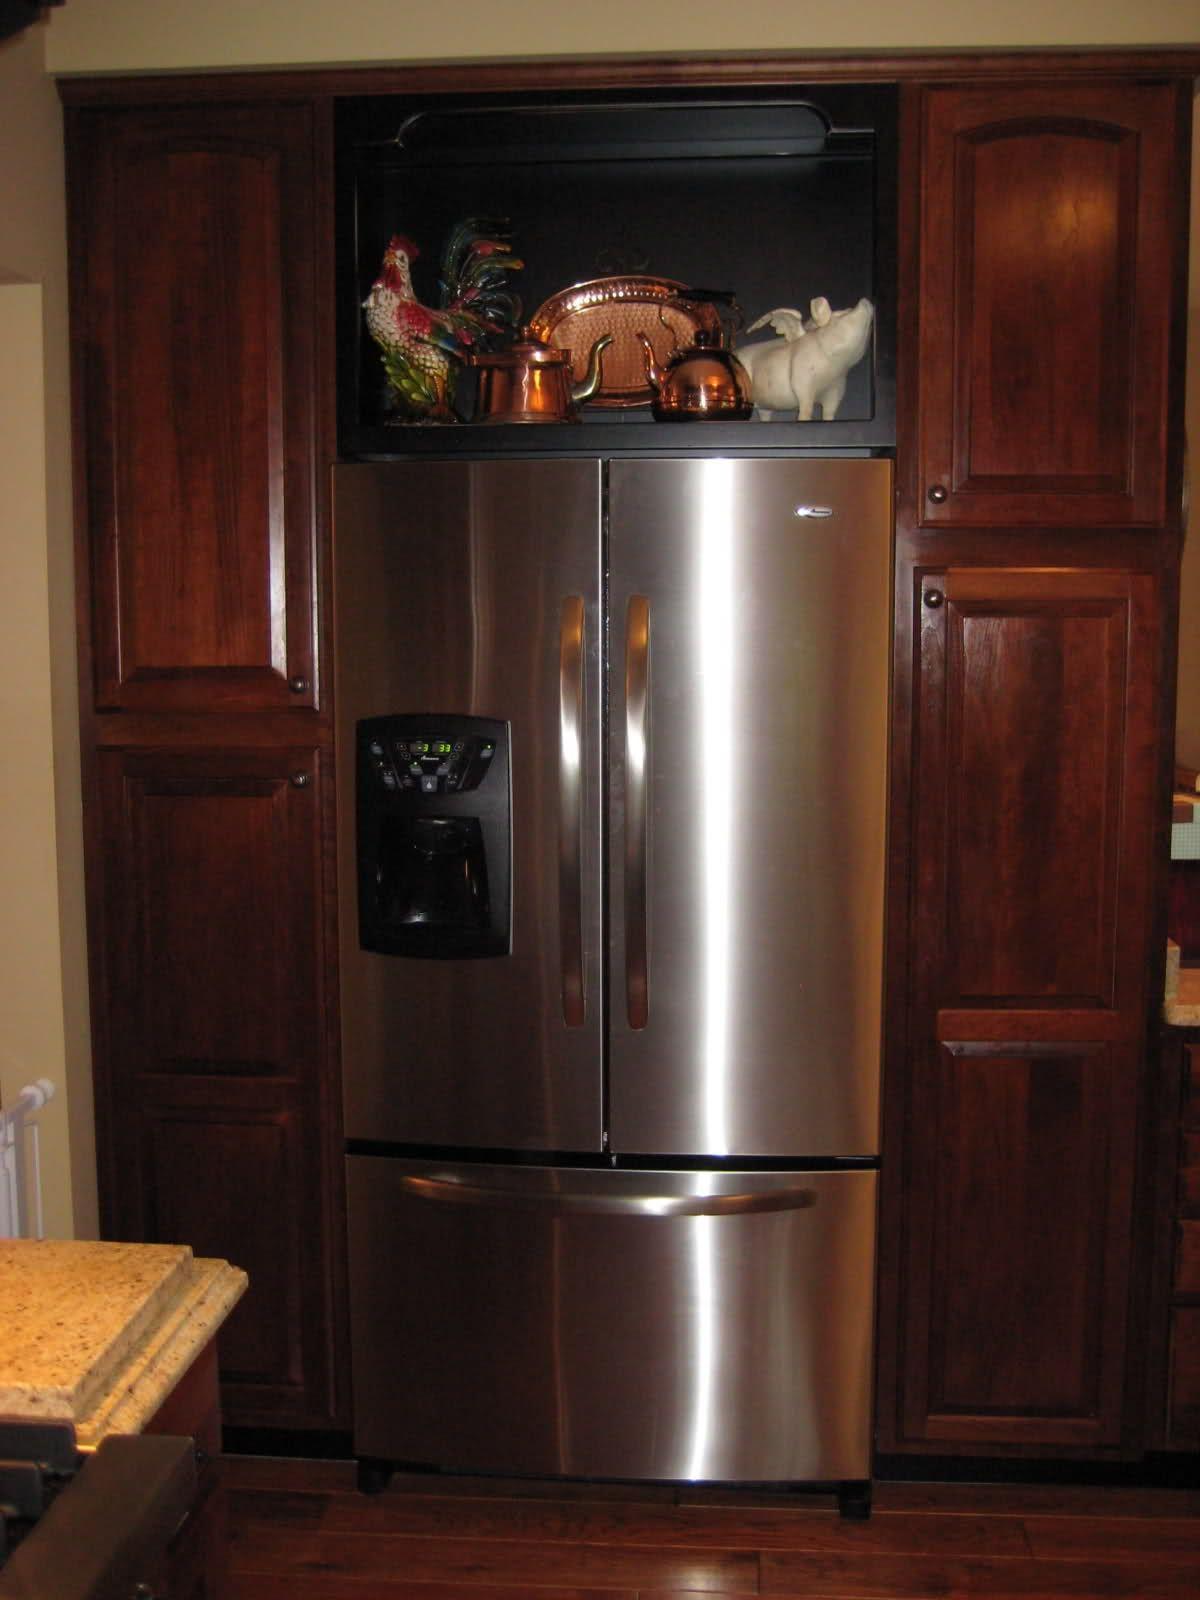 Cabinet Over Fridge Open Shelves Or Glass Cabinet Over The Refrigerator Diy Kitchen Glass Shelves Kitchen